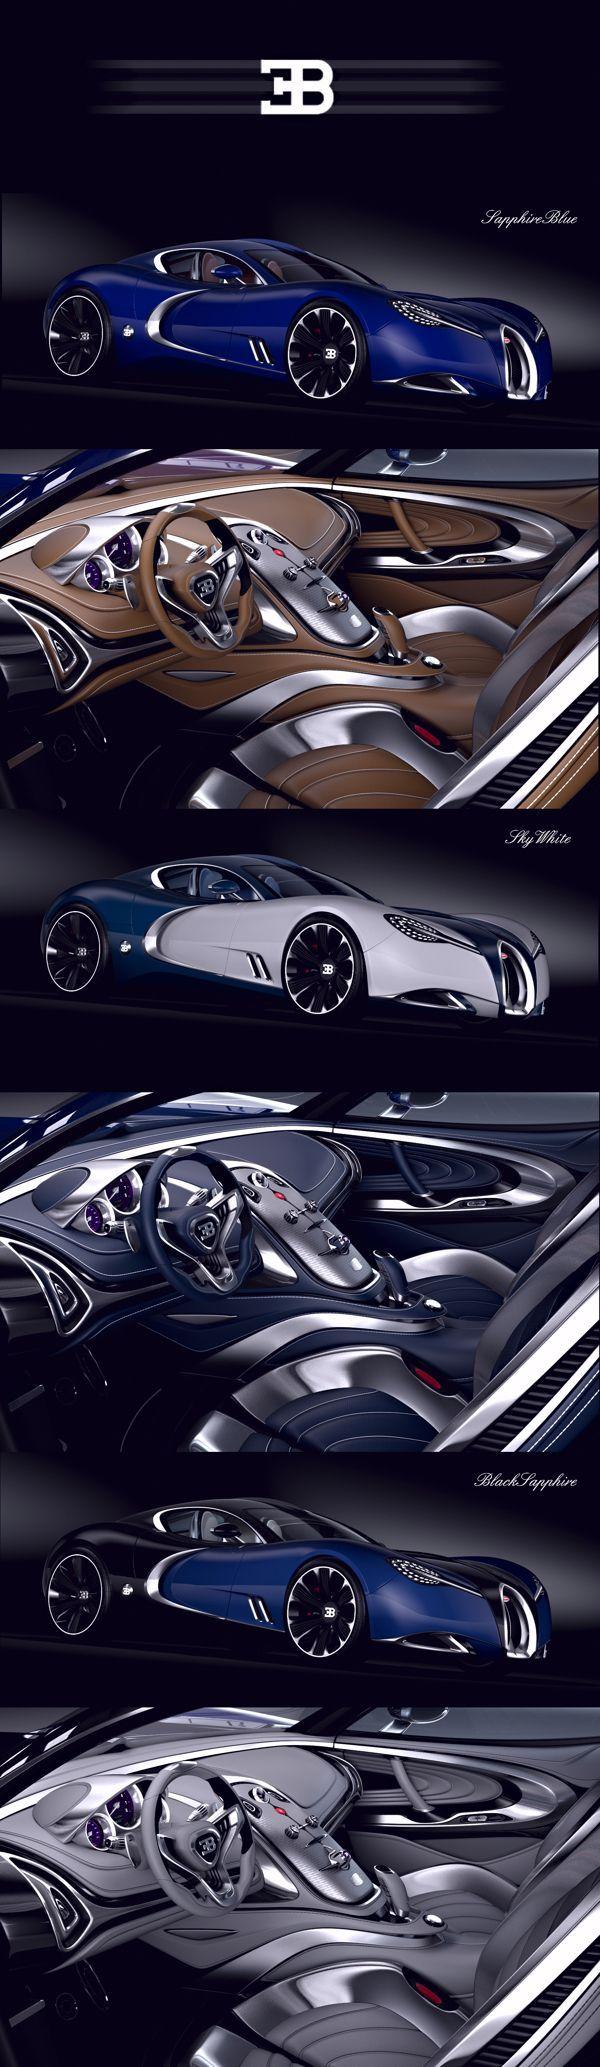 best 25 bugatti concept ideas on pinterest new bugatti. Black Bedroom Furniture Sets. Home Design Ideas